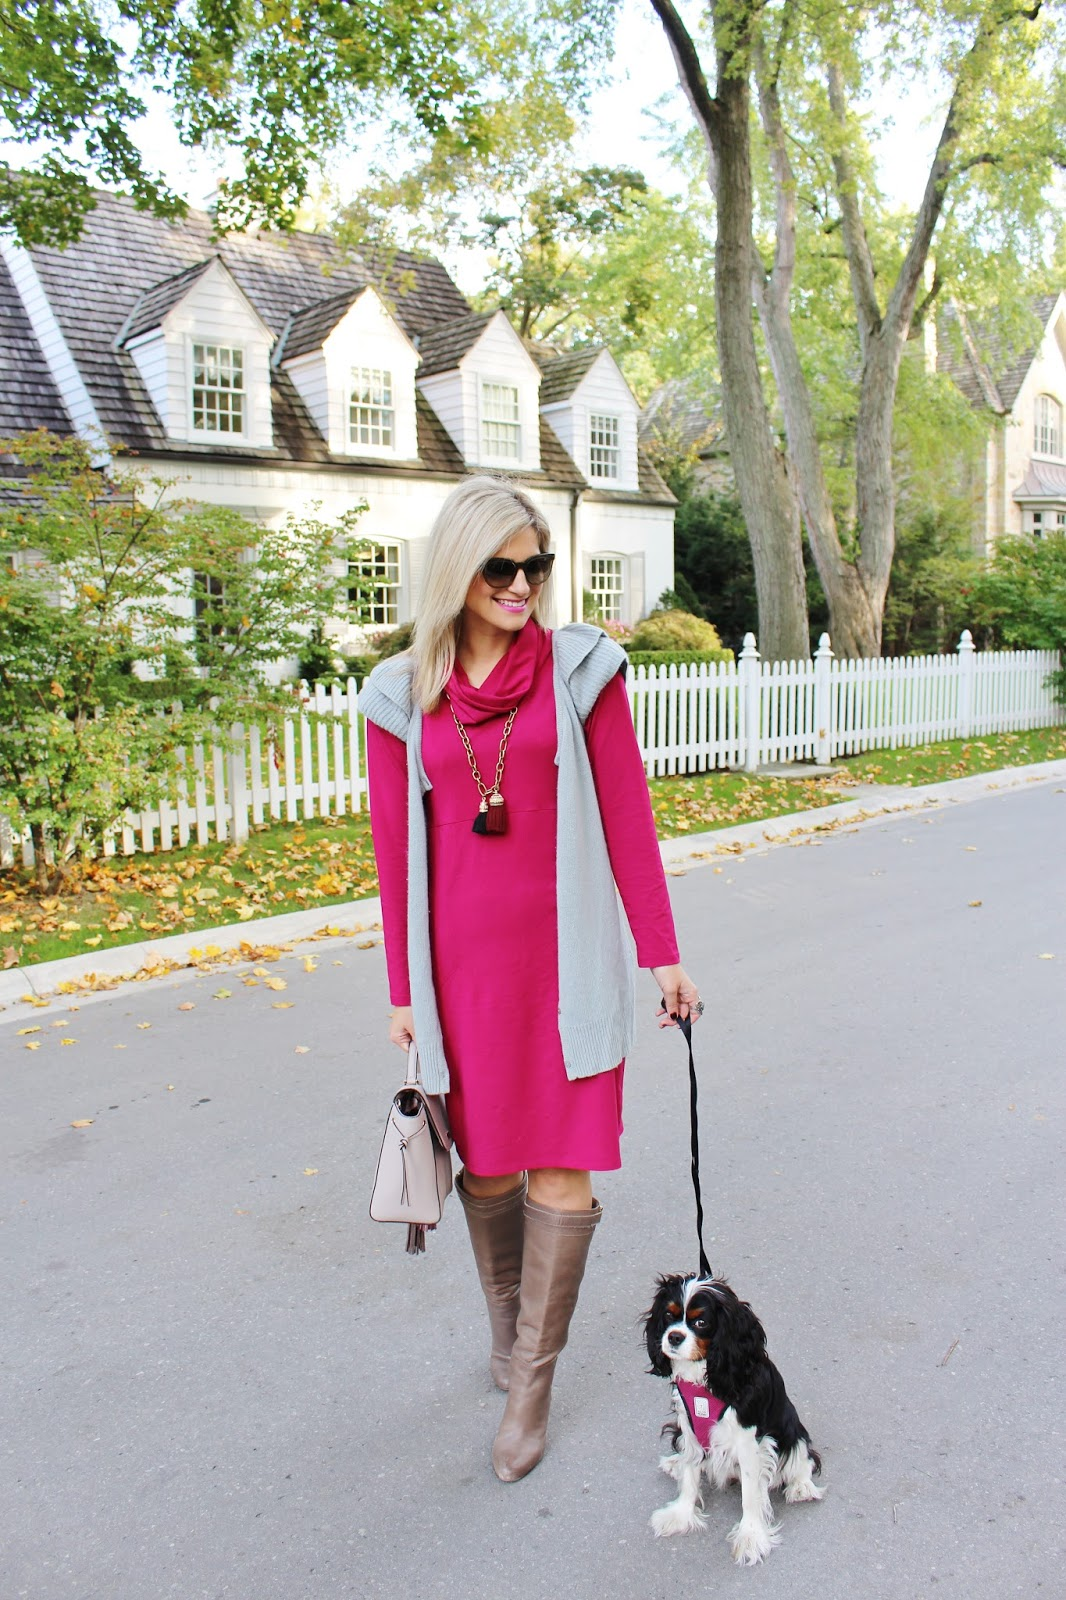 Bijuleni - Miik Cowl Pocket Cranberry Dress with Grey Sweater Vest, Ann Taylor Ankle Boots, Kate Spade handbag